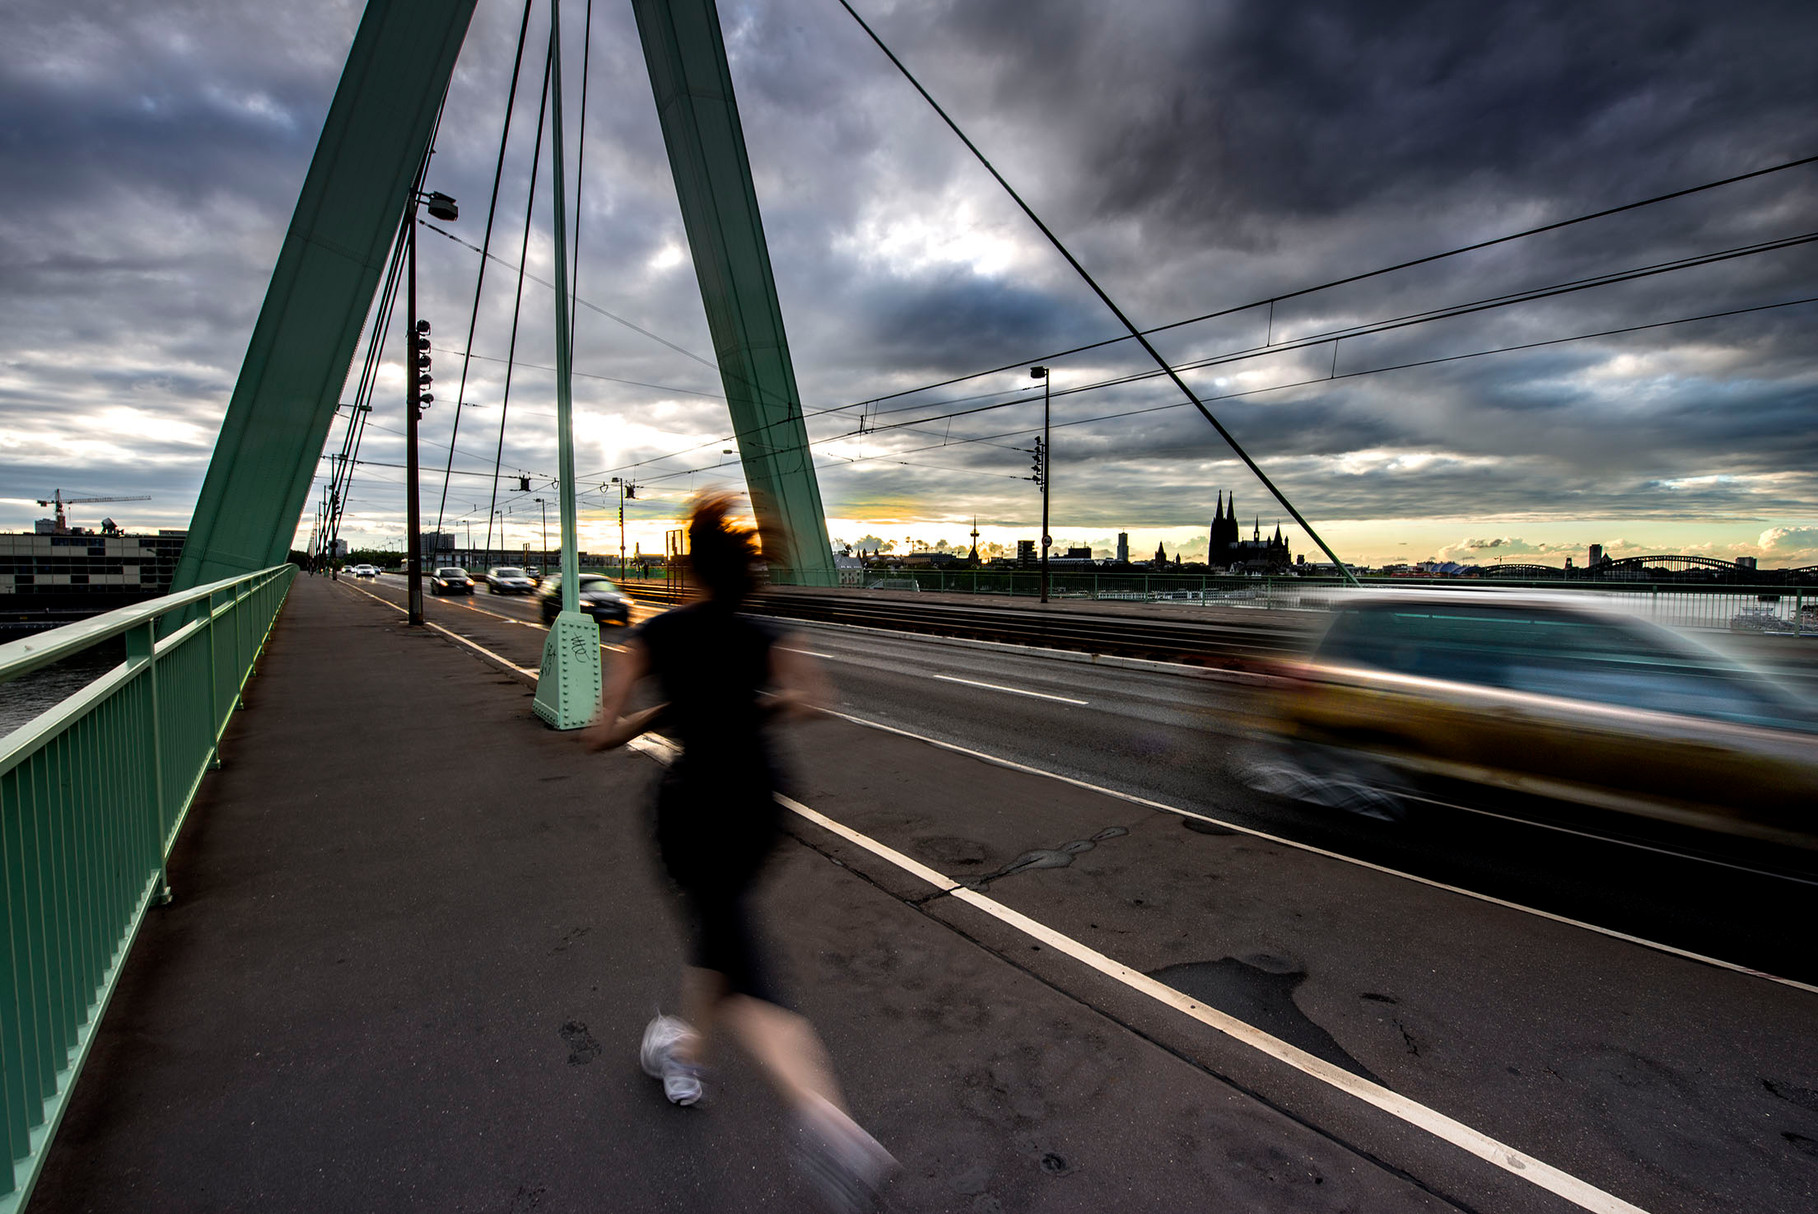 Crossing the bridge (Köln, Germany)